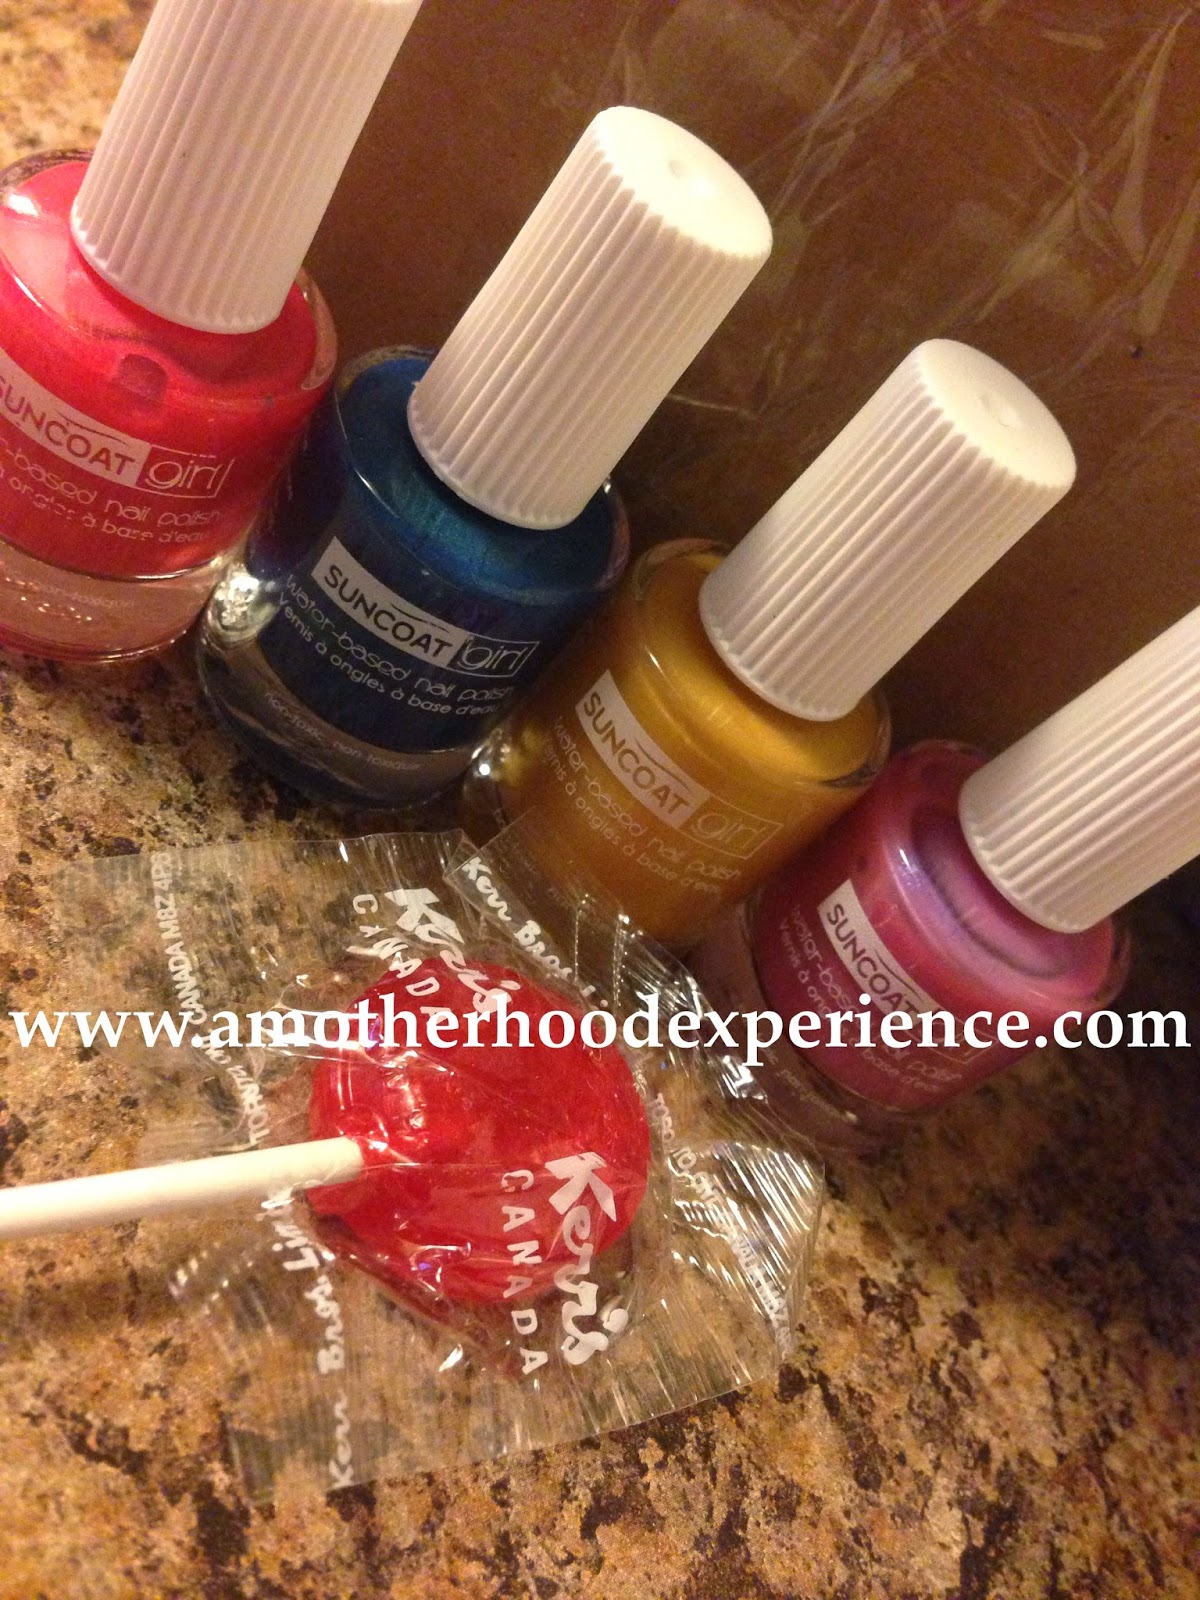 Suncoat Girl Kids Nail Polish ~ A MotherHood Experience